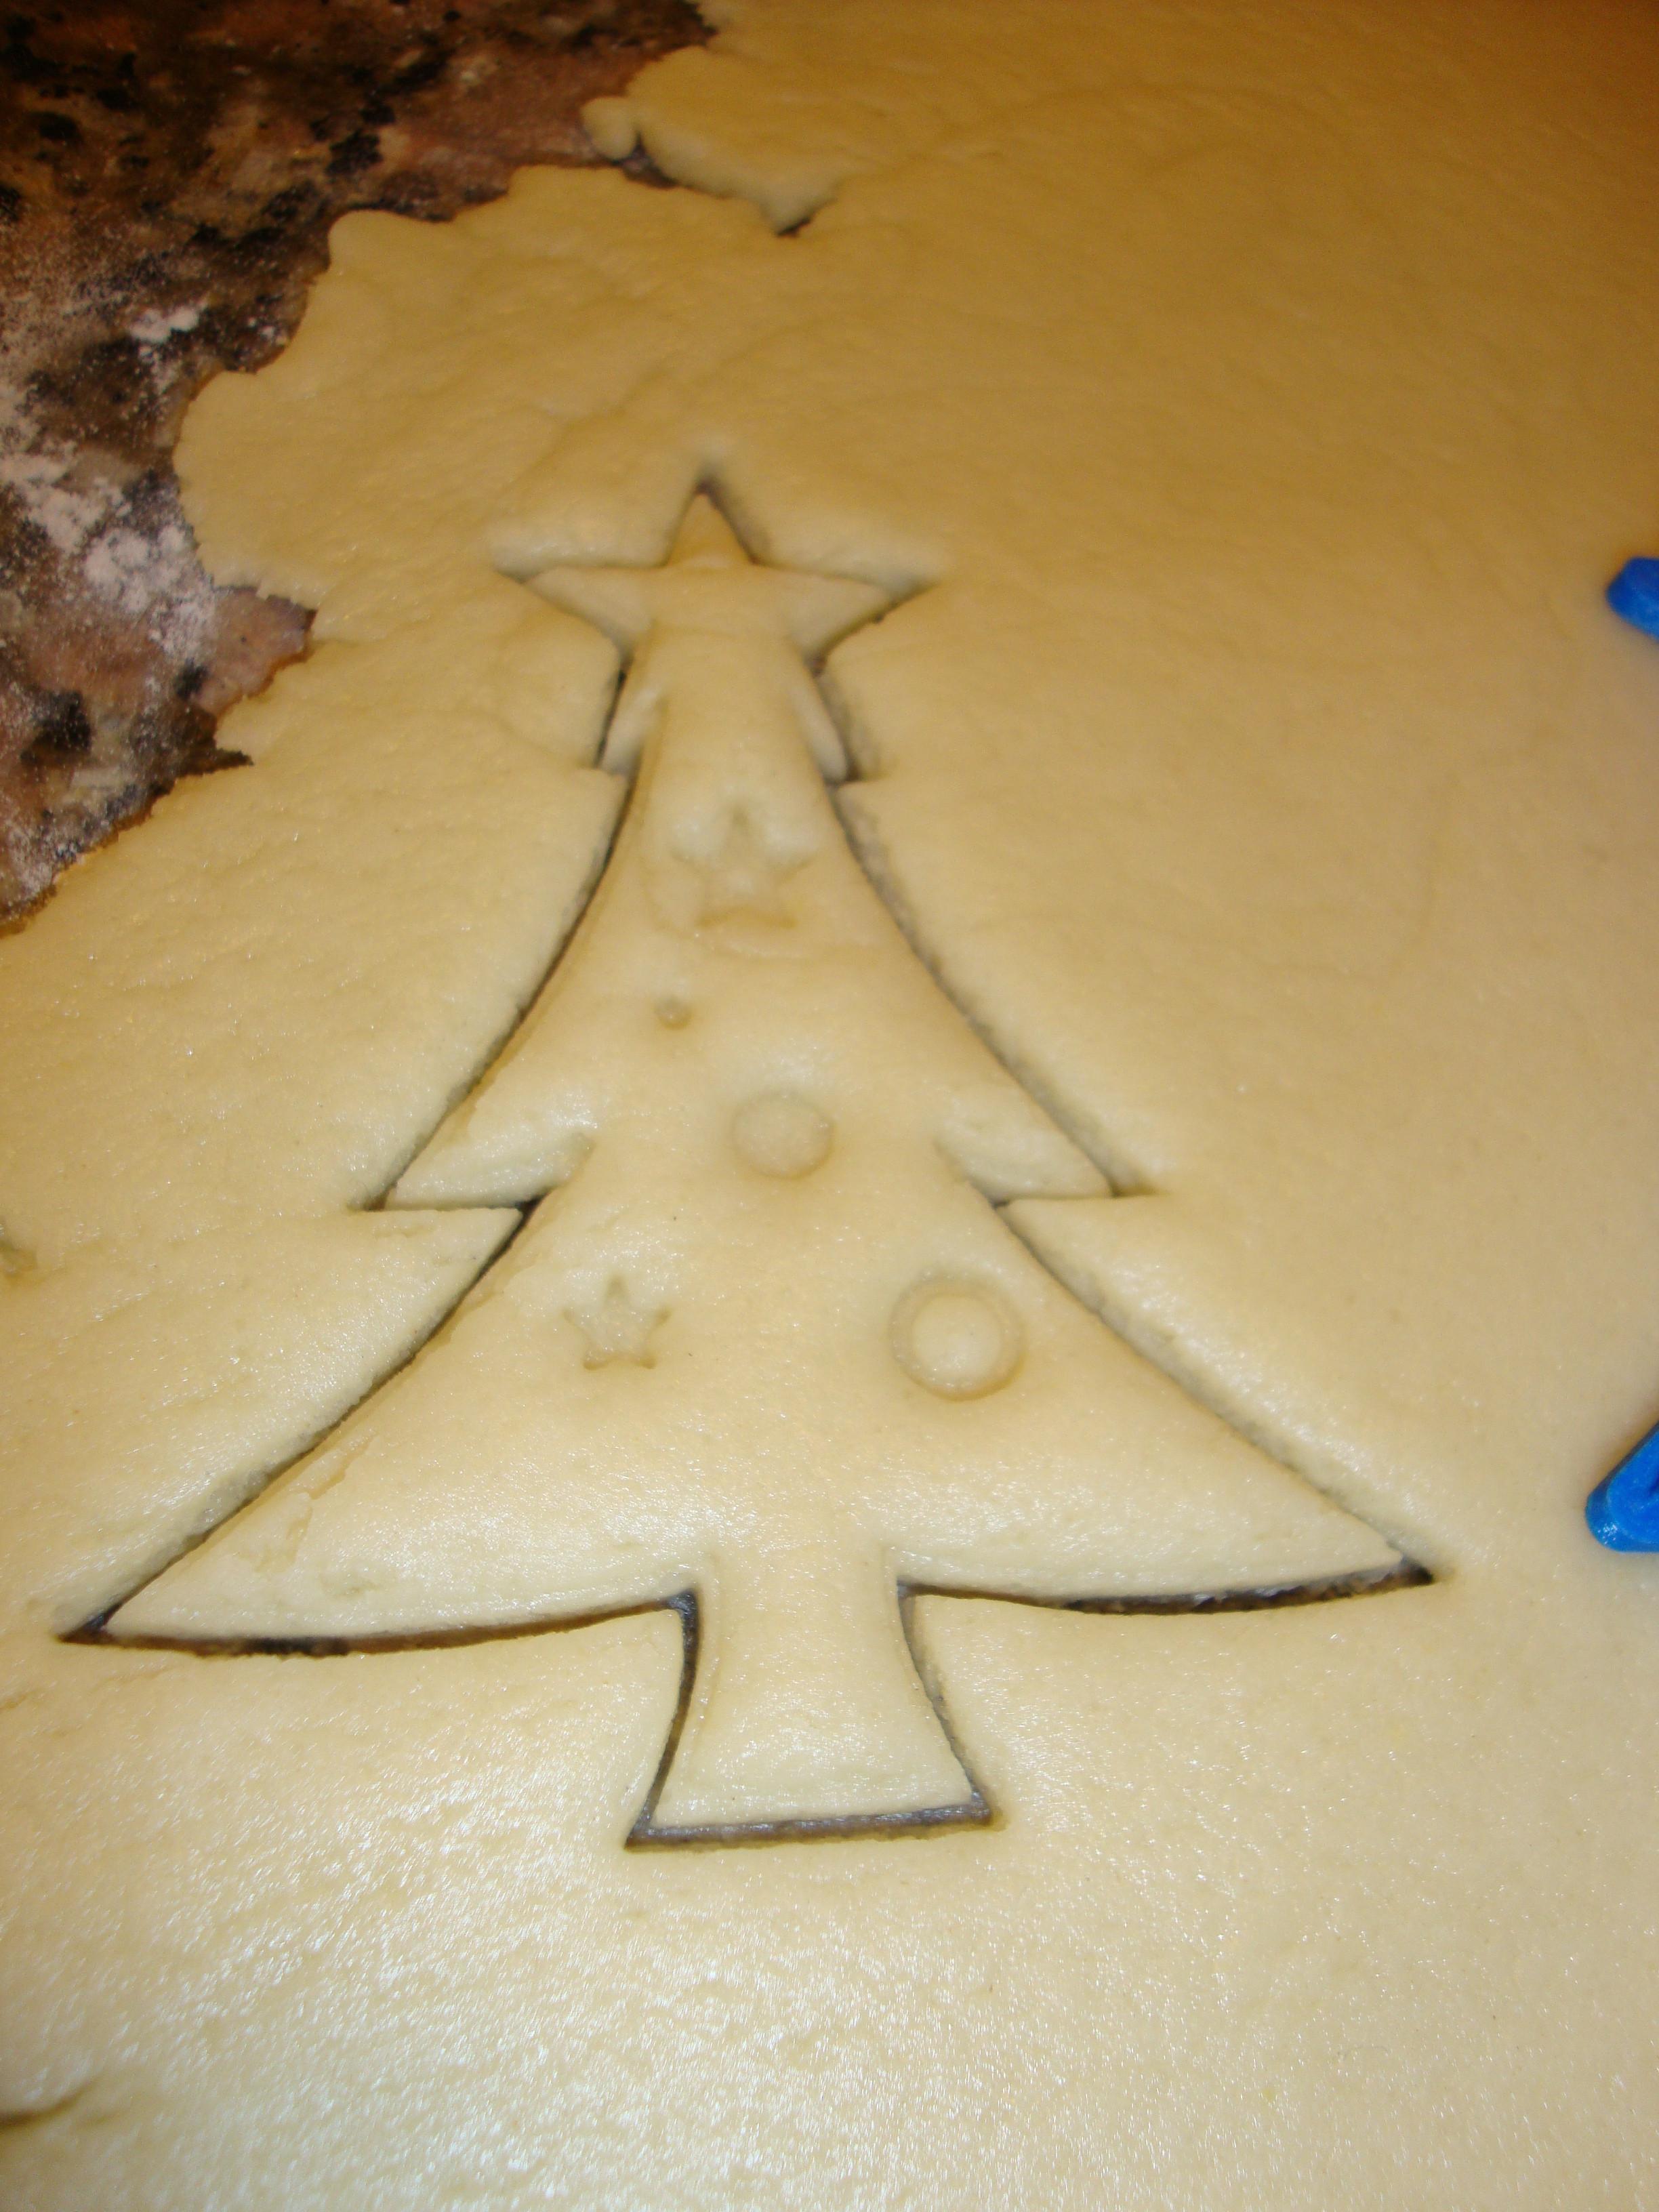 DSC04552.JPG Download STL file Cookie Cutter Christmas Tree • 3D printer template, Kukens